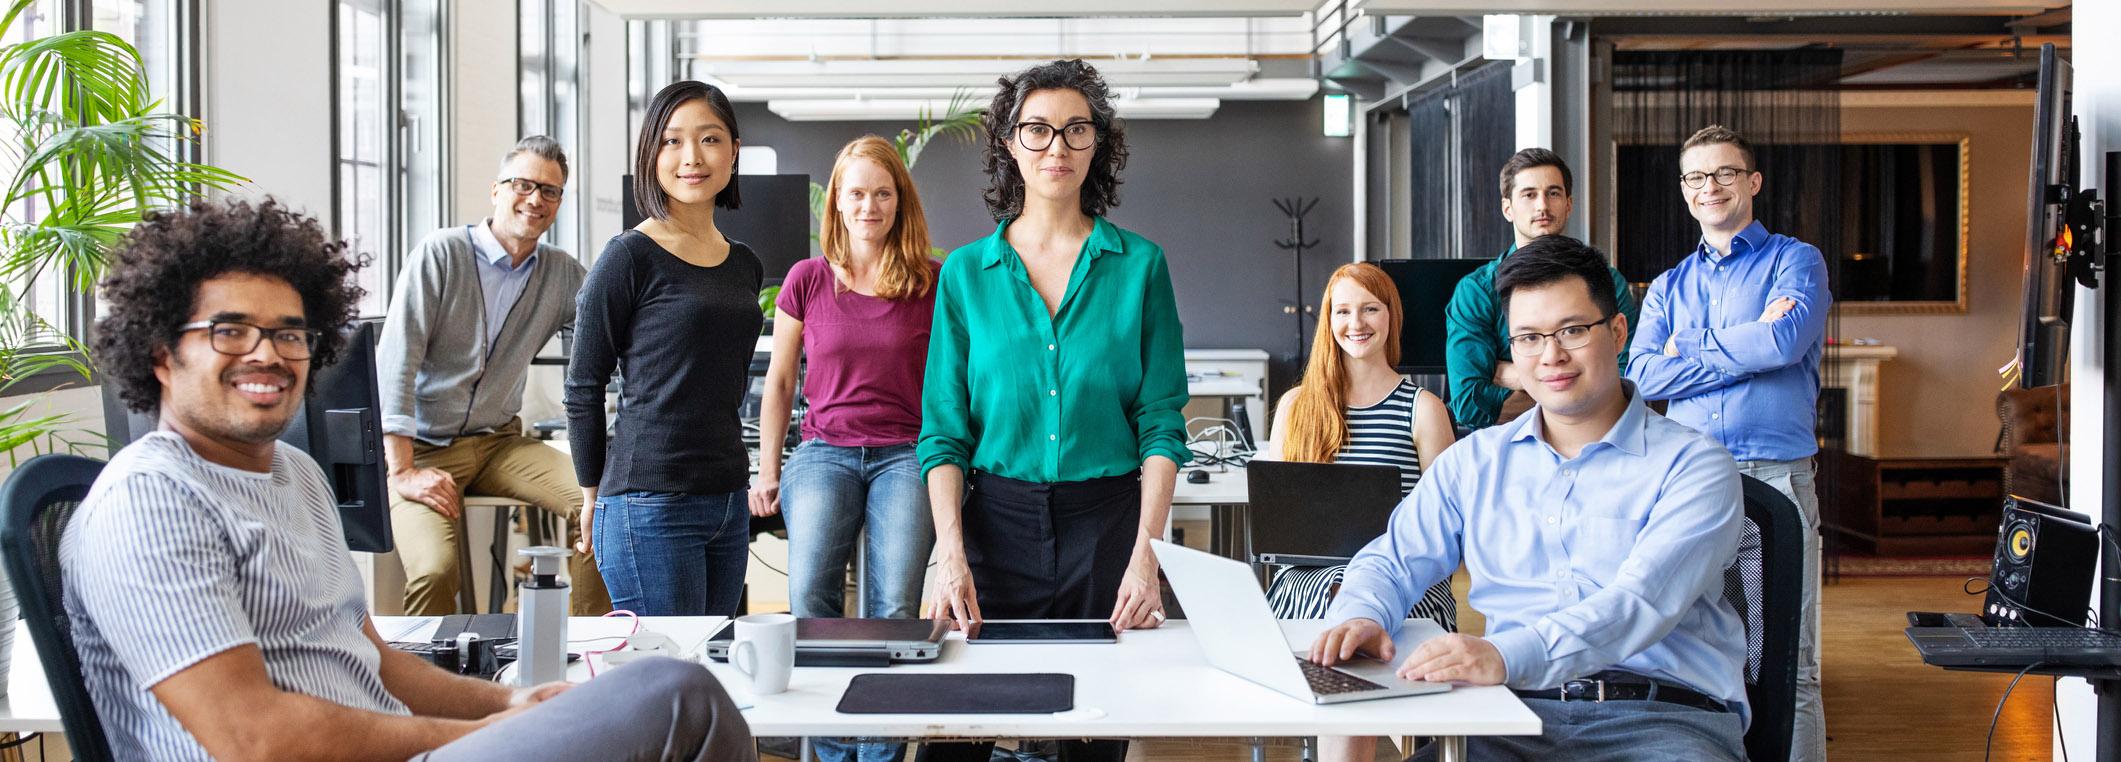 Portrait of successful business professionals